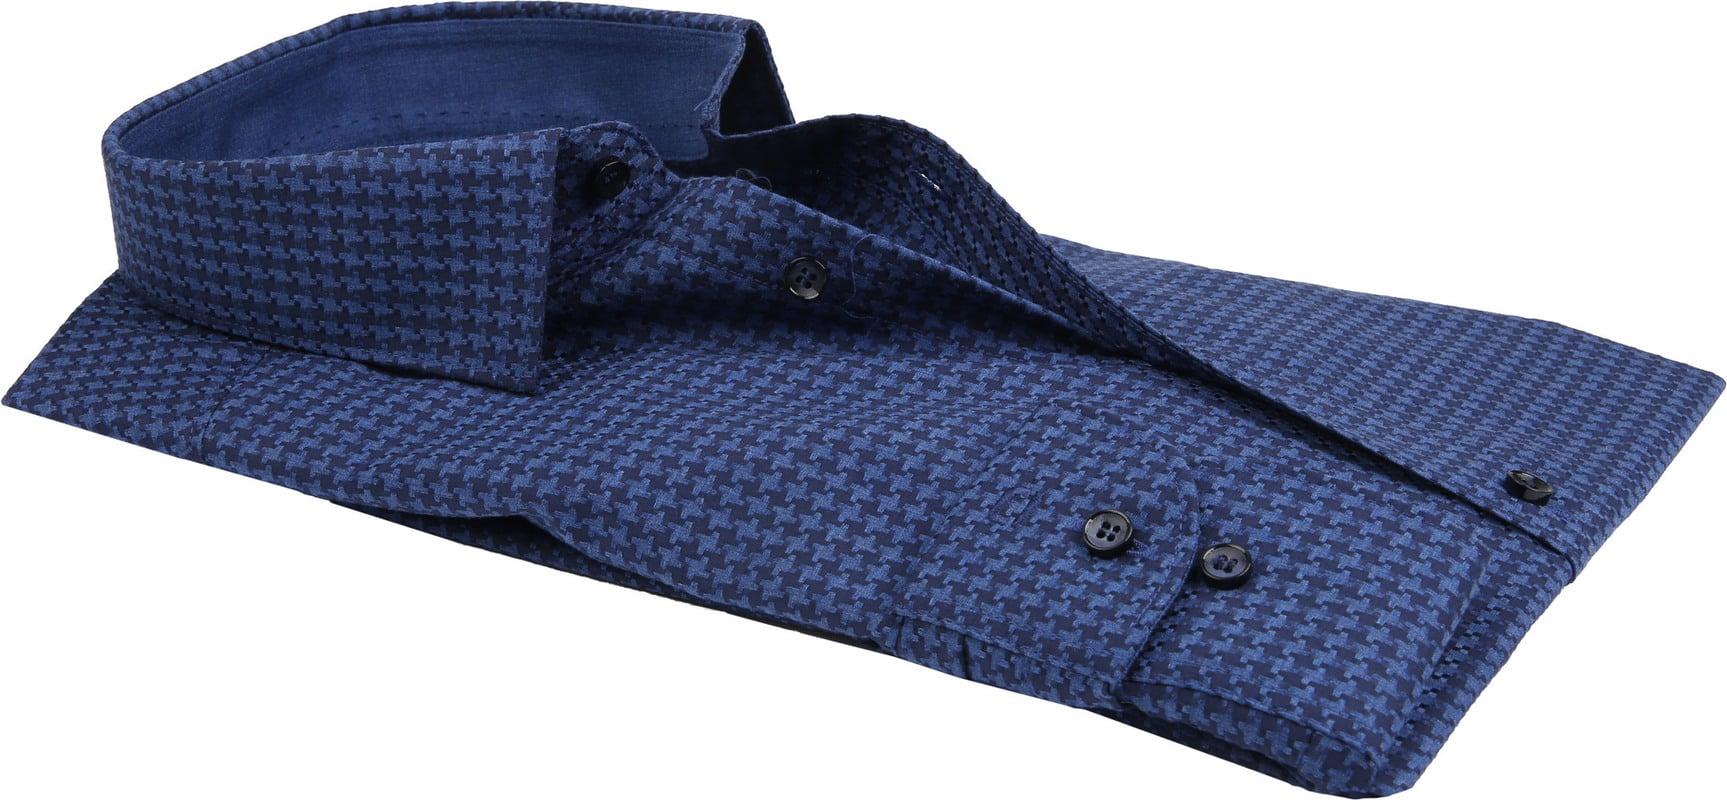 OLYMP Overhemd Level 5 Pied De Poule - Donkerblauw maat 40